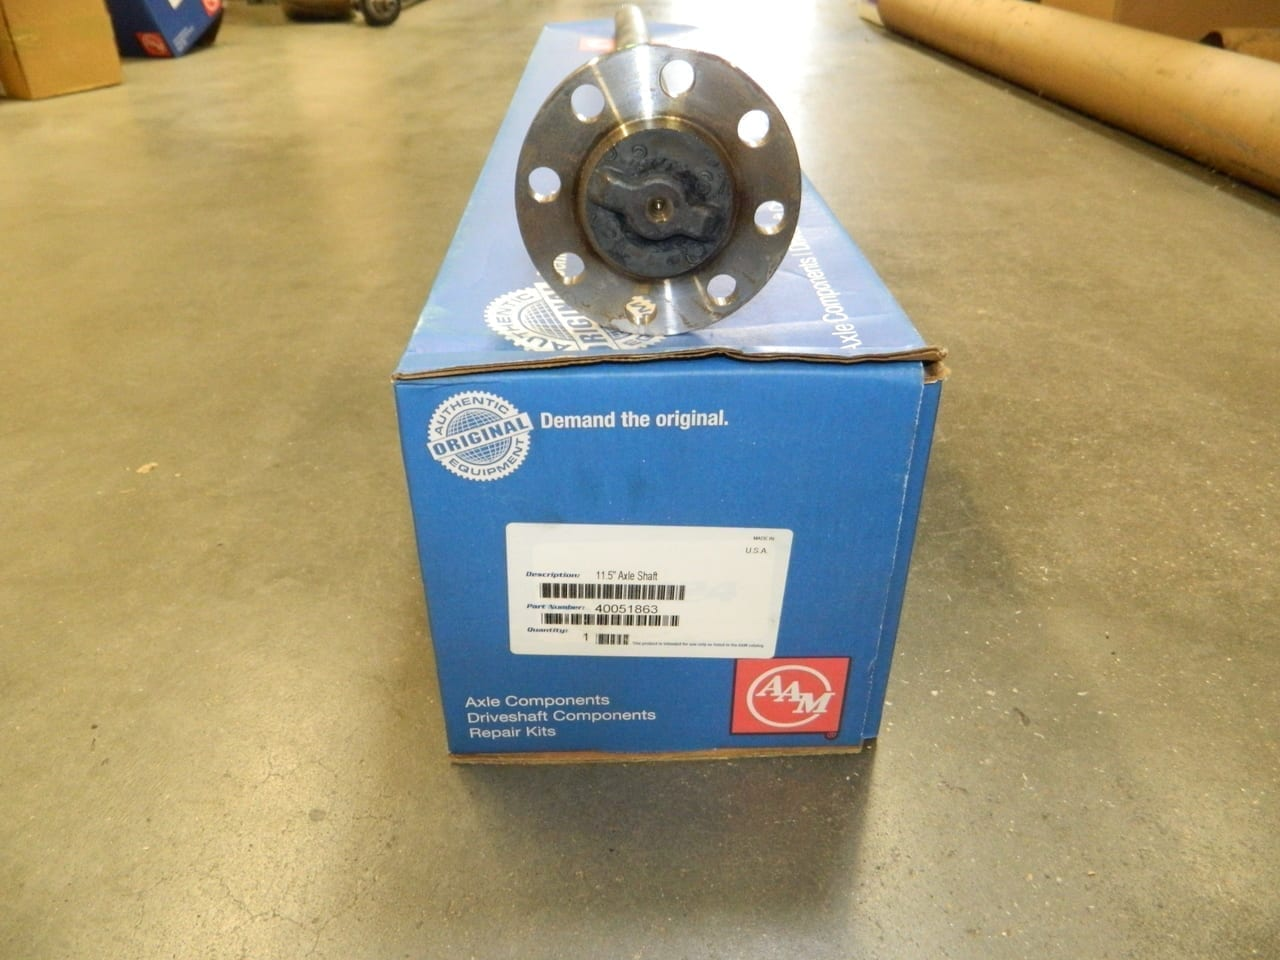 2010-2014 Chevy GM 11 5 Rear Axle Shaft 40 2756